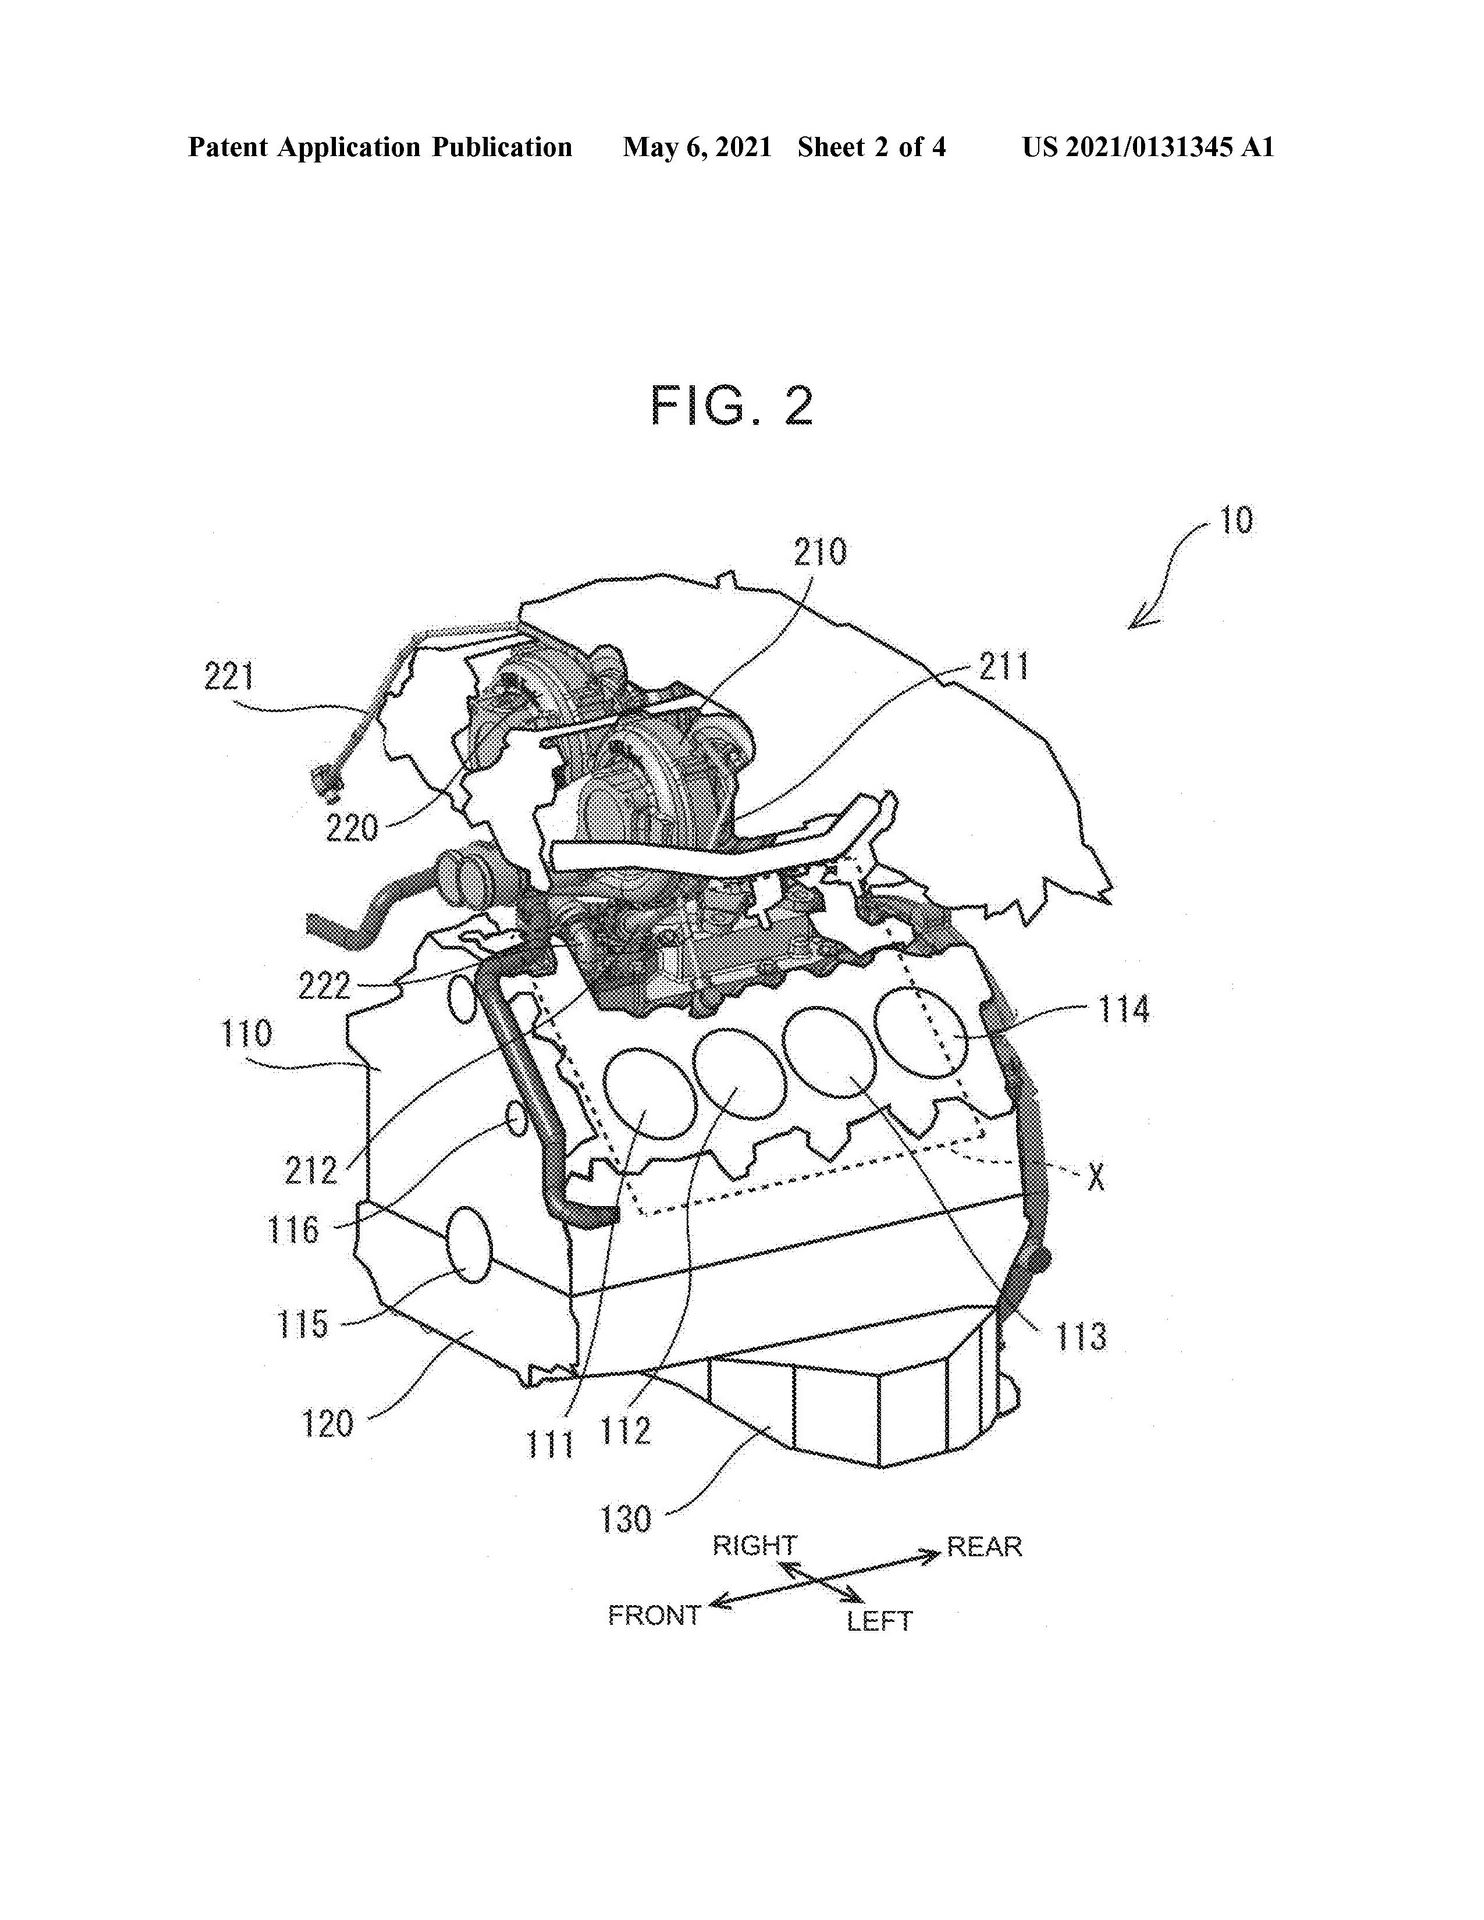 Toyota-Twin-Turbo-V8-Patent-0003